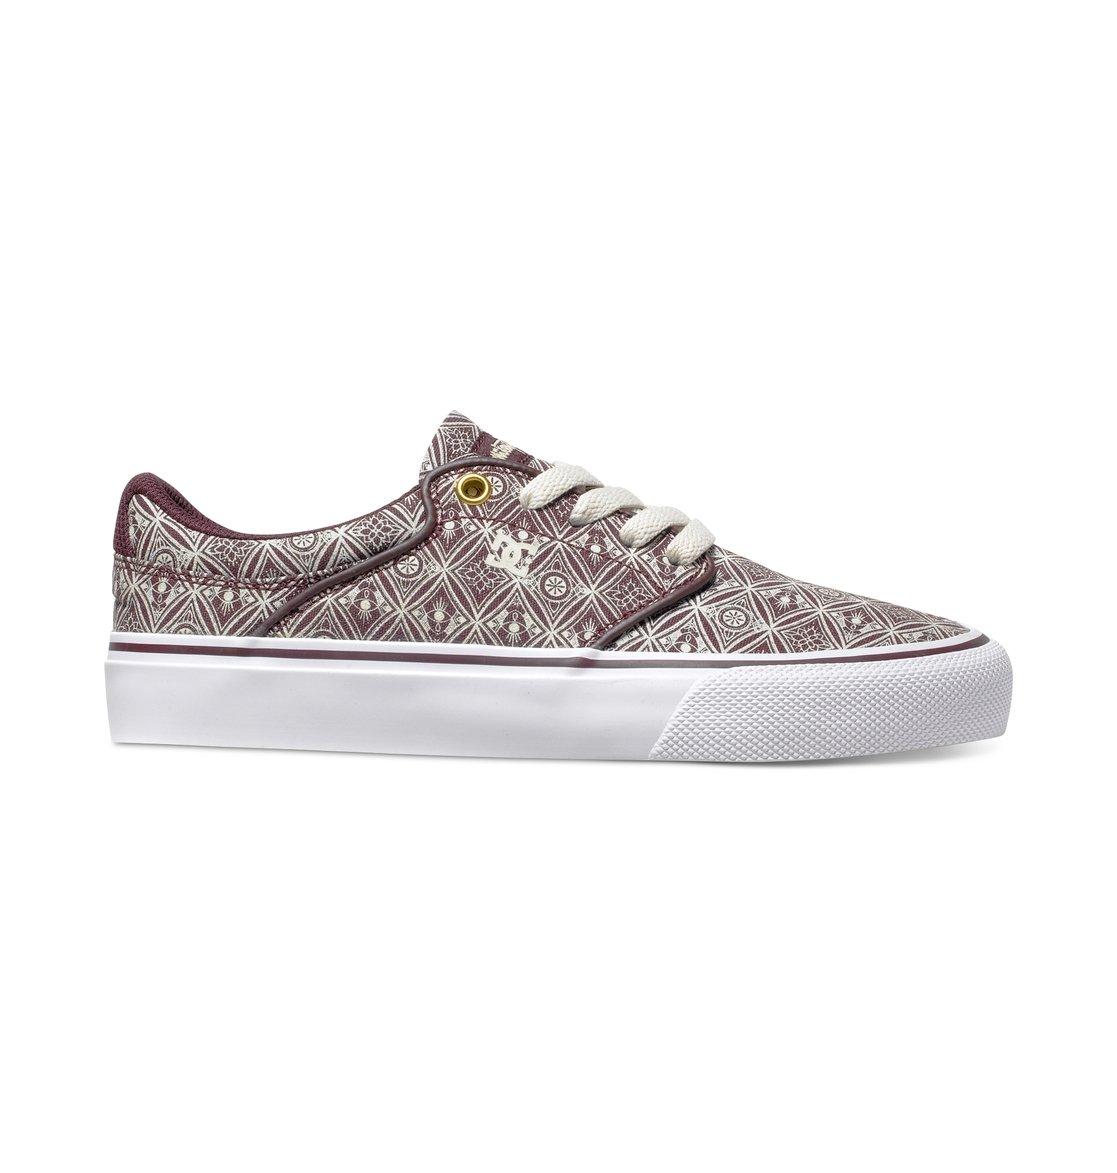 Mikey Taylor Vulc SP от DC Shoes